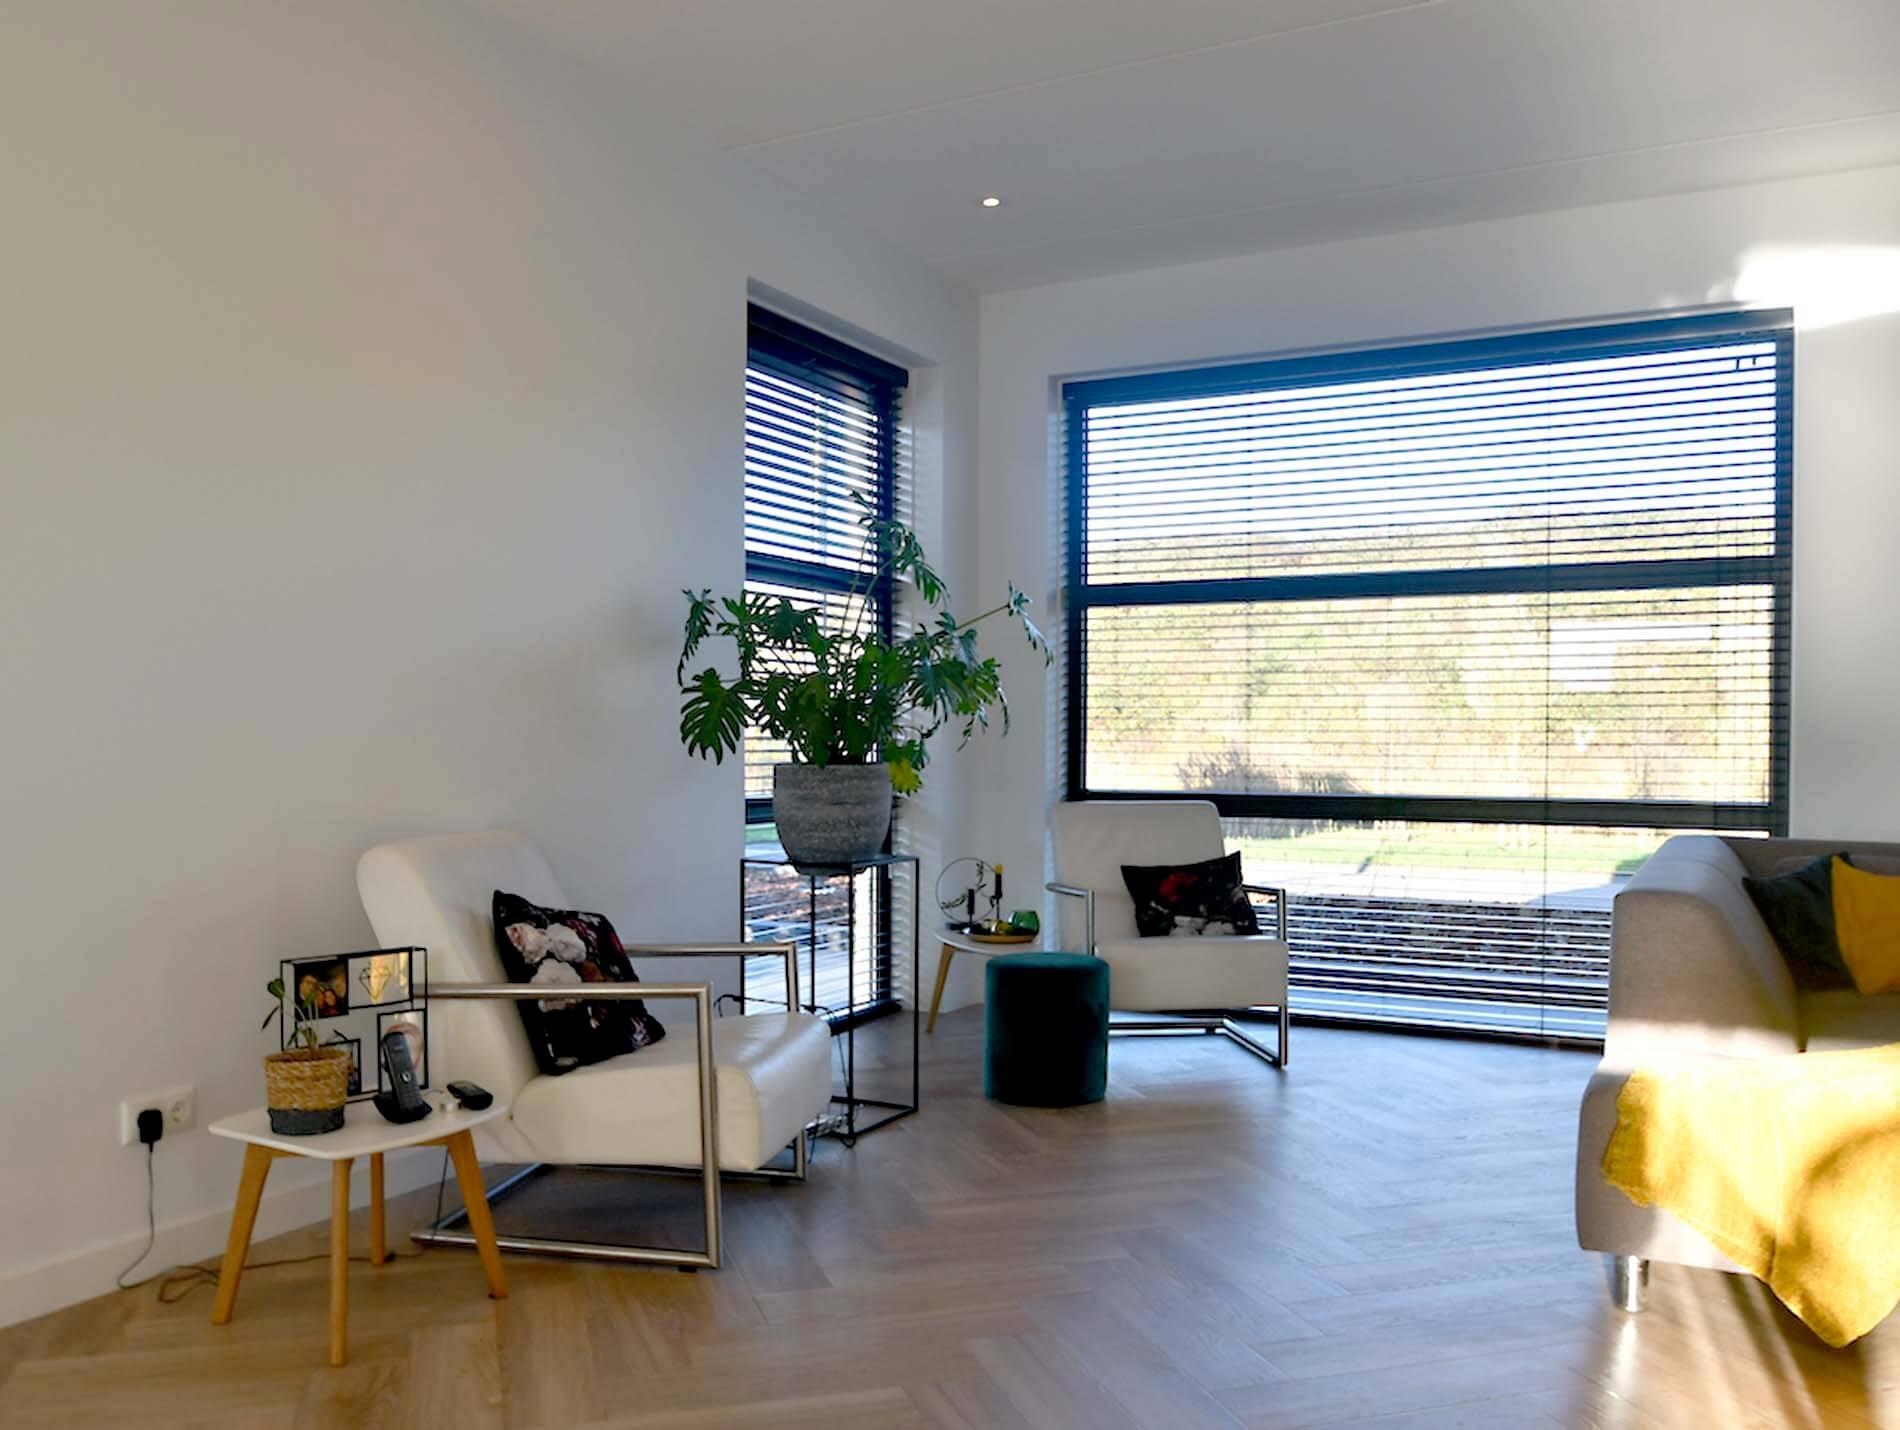 12.Interieur-drachten-nieuwbouw-woning-1900x1430p.jpg